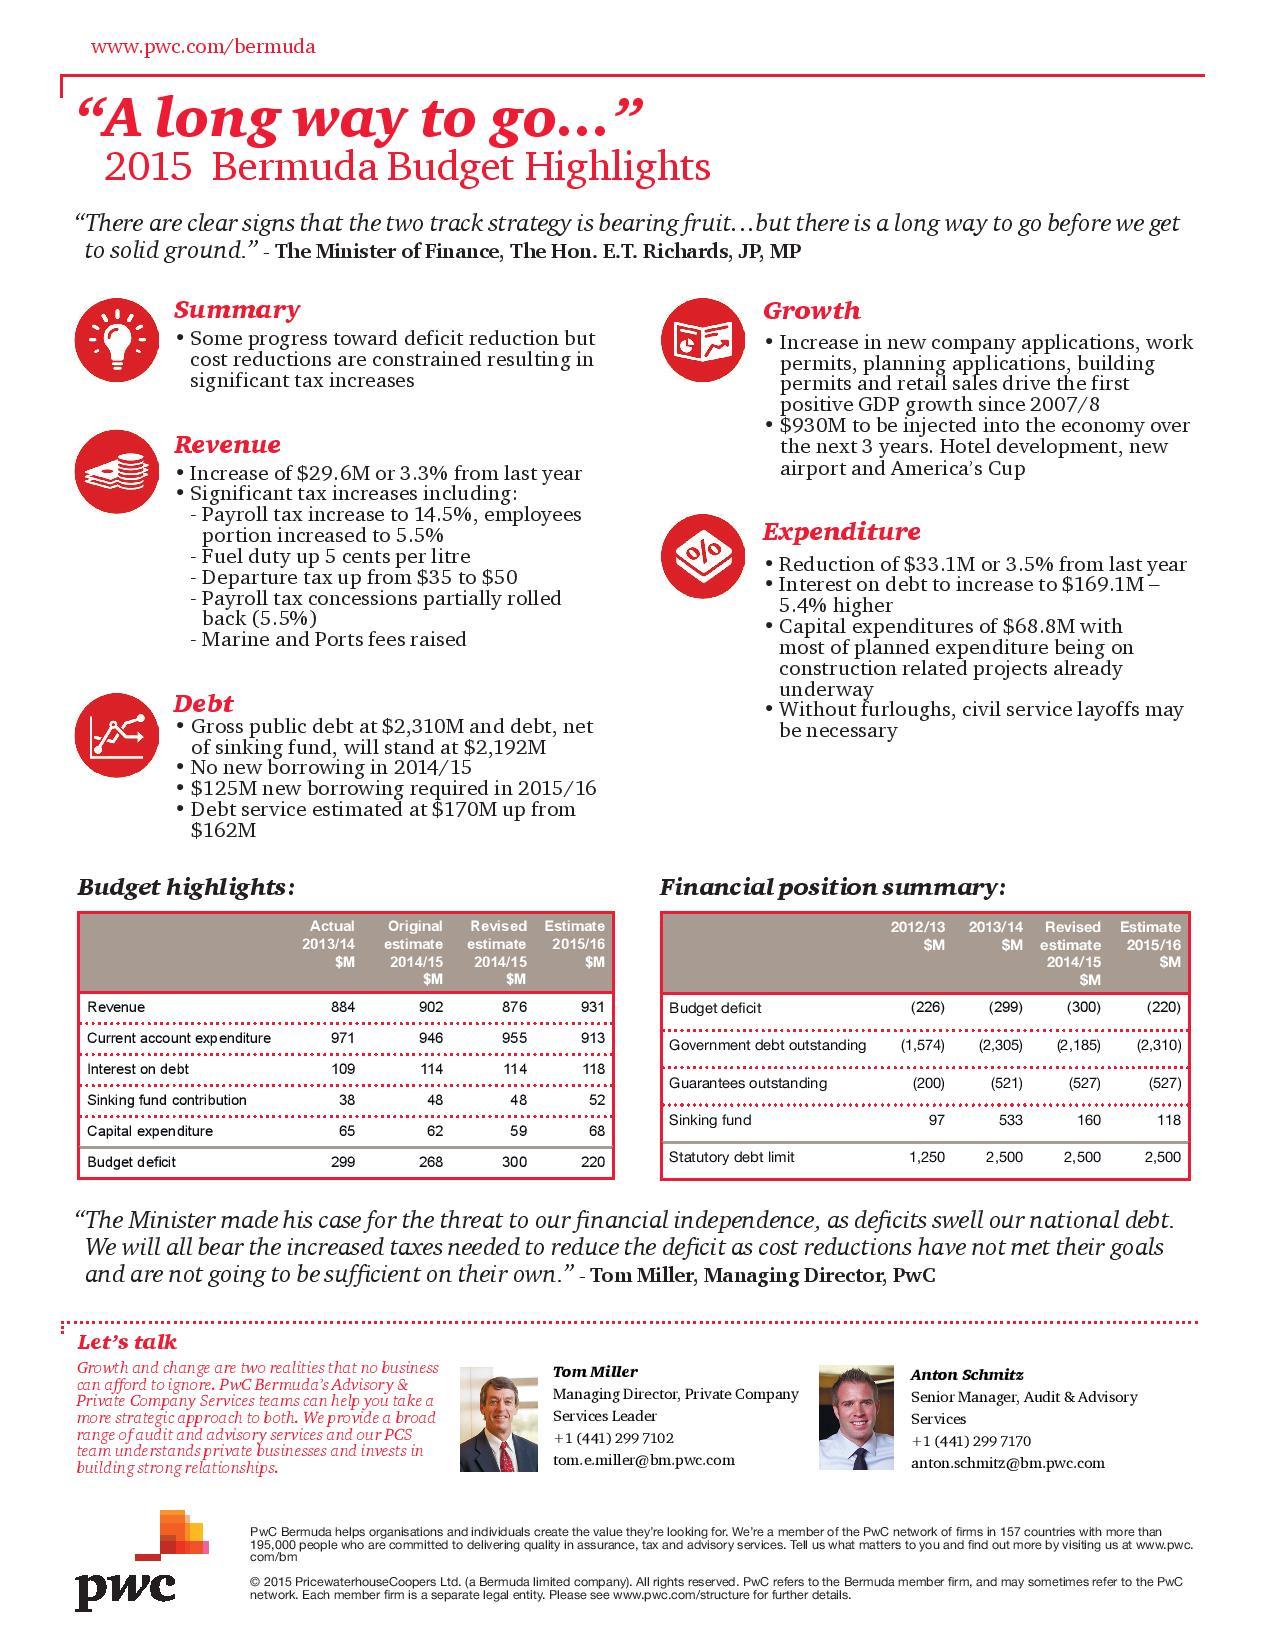 PwC 2015 Bermuda Budget Highlights-page-001